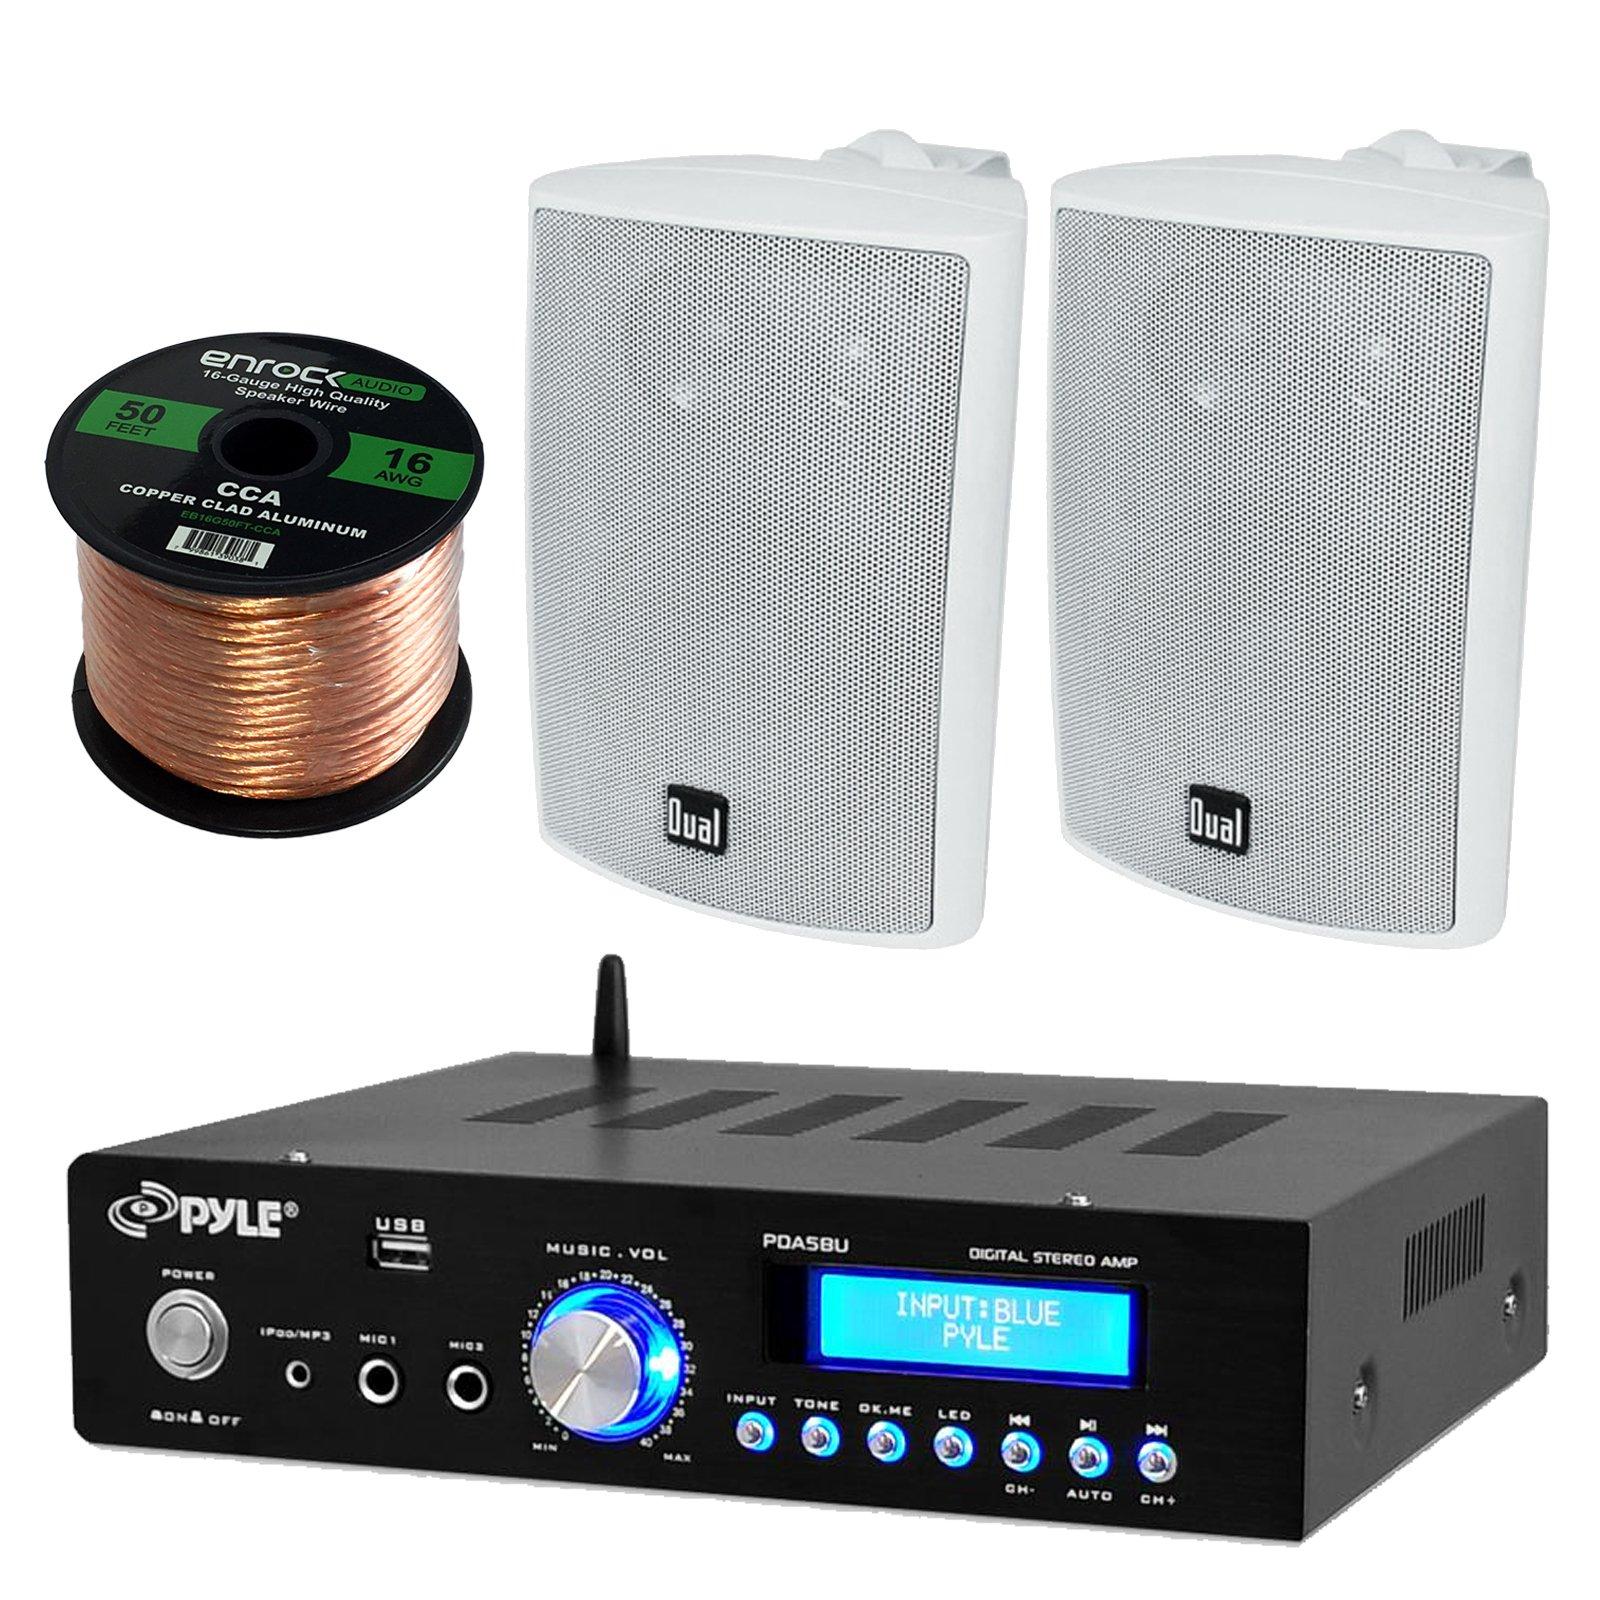 Pyle PDA5BU Amplifier Receiver Stereo, Bluetooth, AM/FM Radio, USB Flash Reader, Aux input (3.5mm) LCD Display, 200 Watt - Bundle With Enrock 50ft 16g Speaker Wire